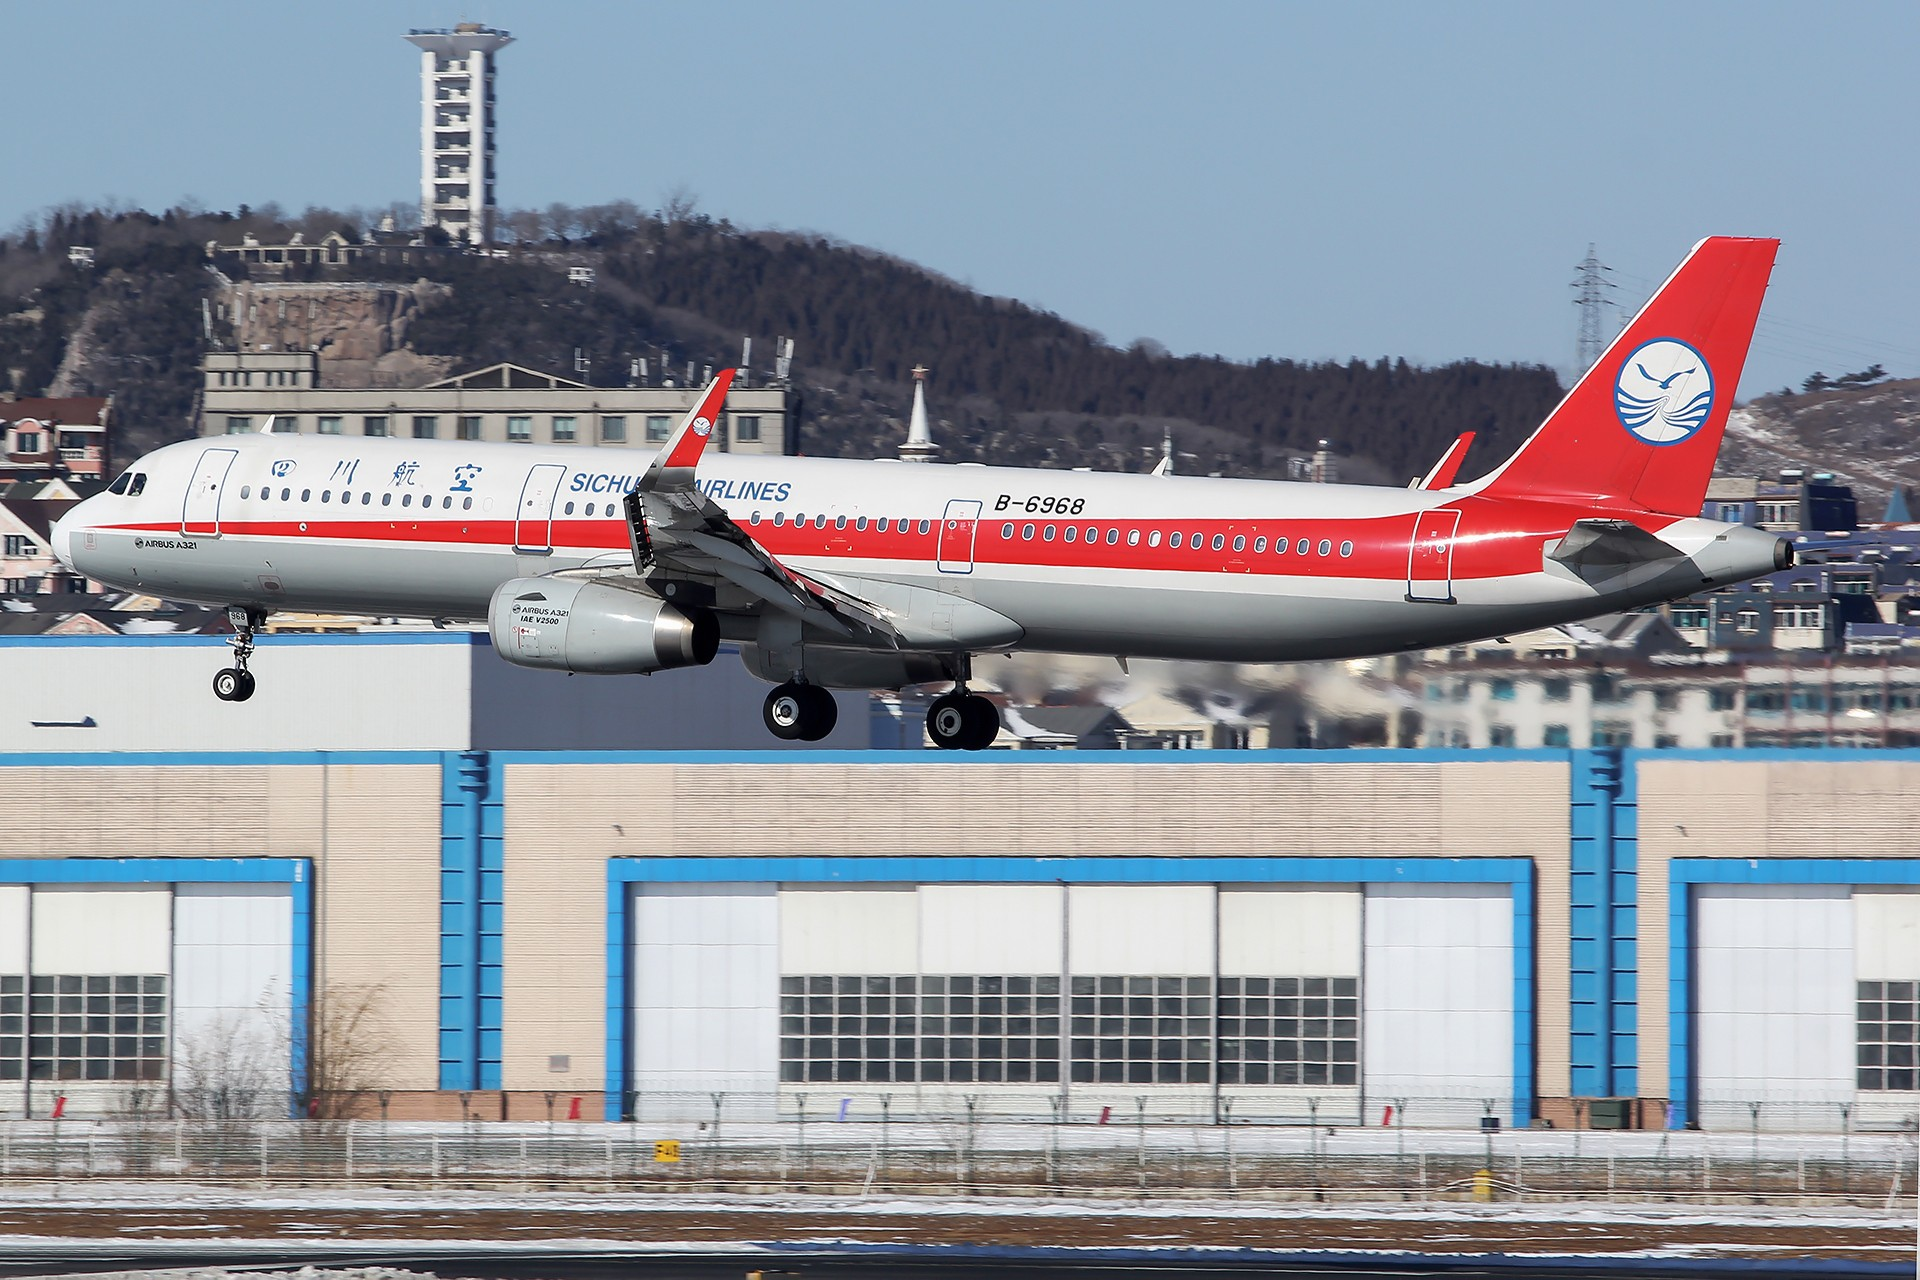 Re:[原创][DLC]。。。雪后天真就这么蓝。。。 AIRBUS A321-200 B-6968 中国大连国际机场